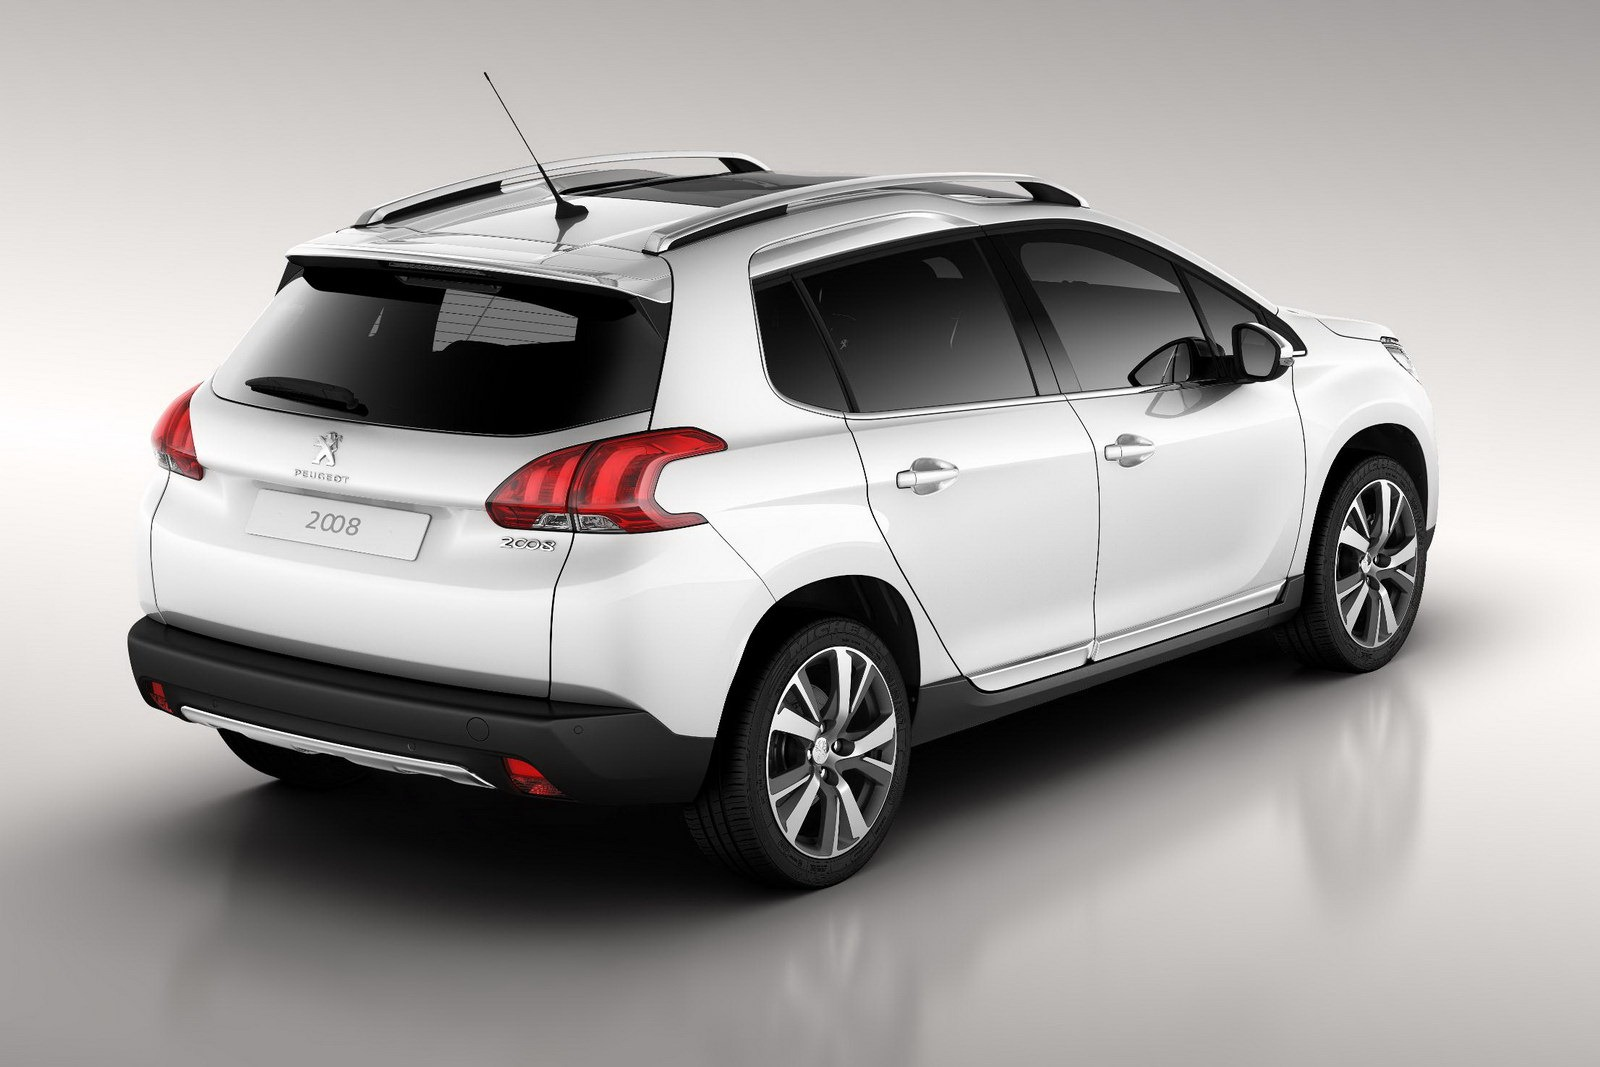 SPOILER All-New Peugeot 2008 ~ Automotive